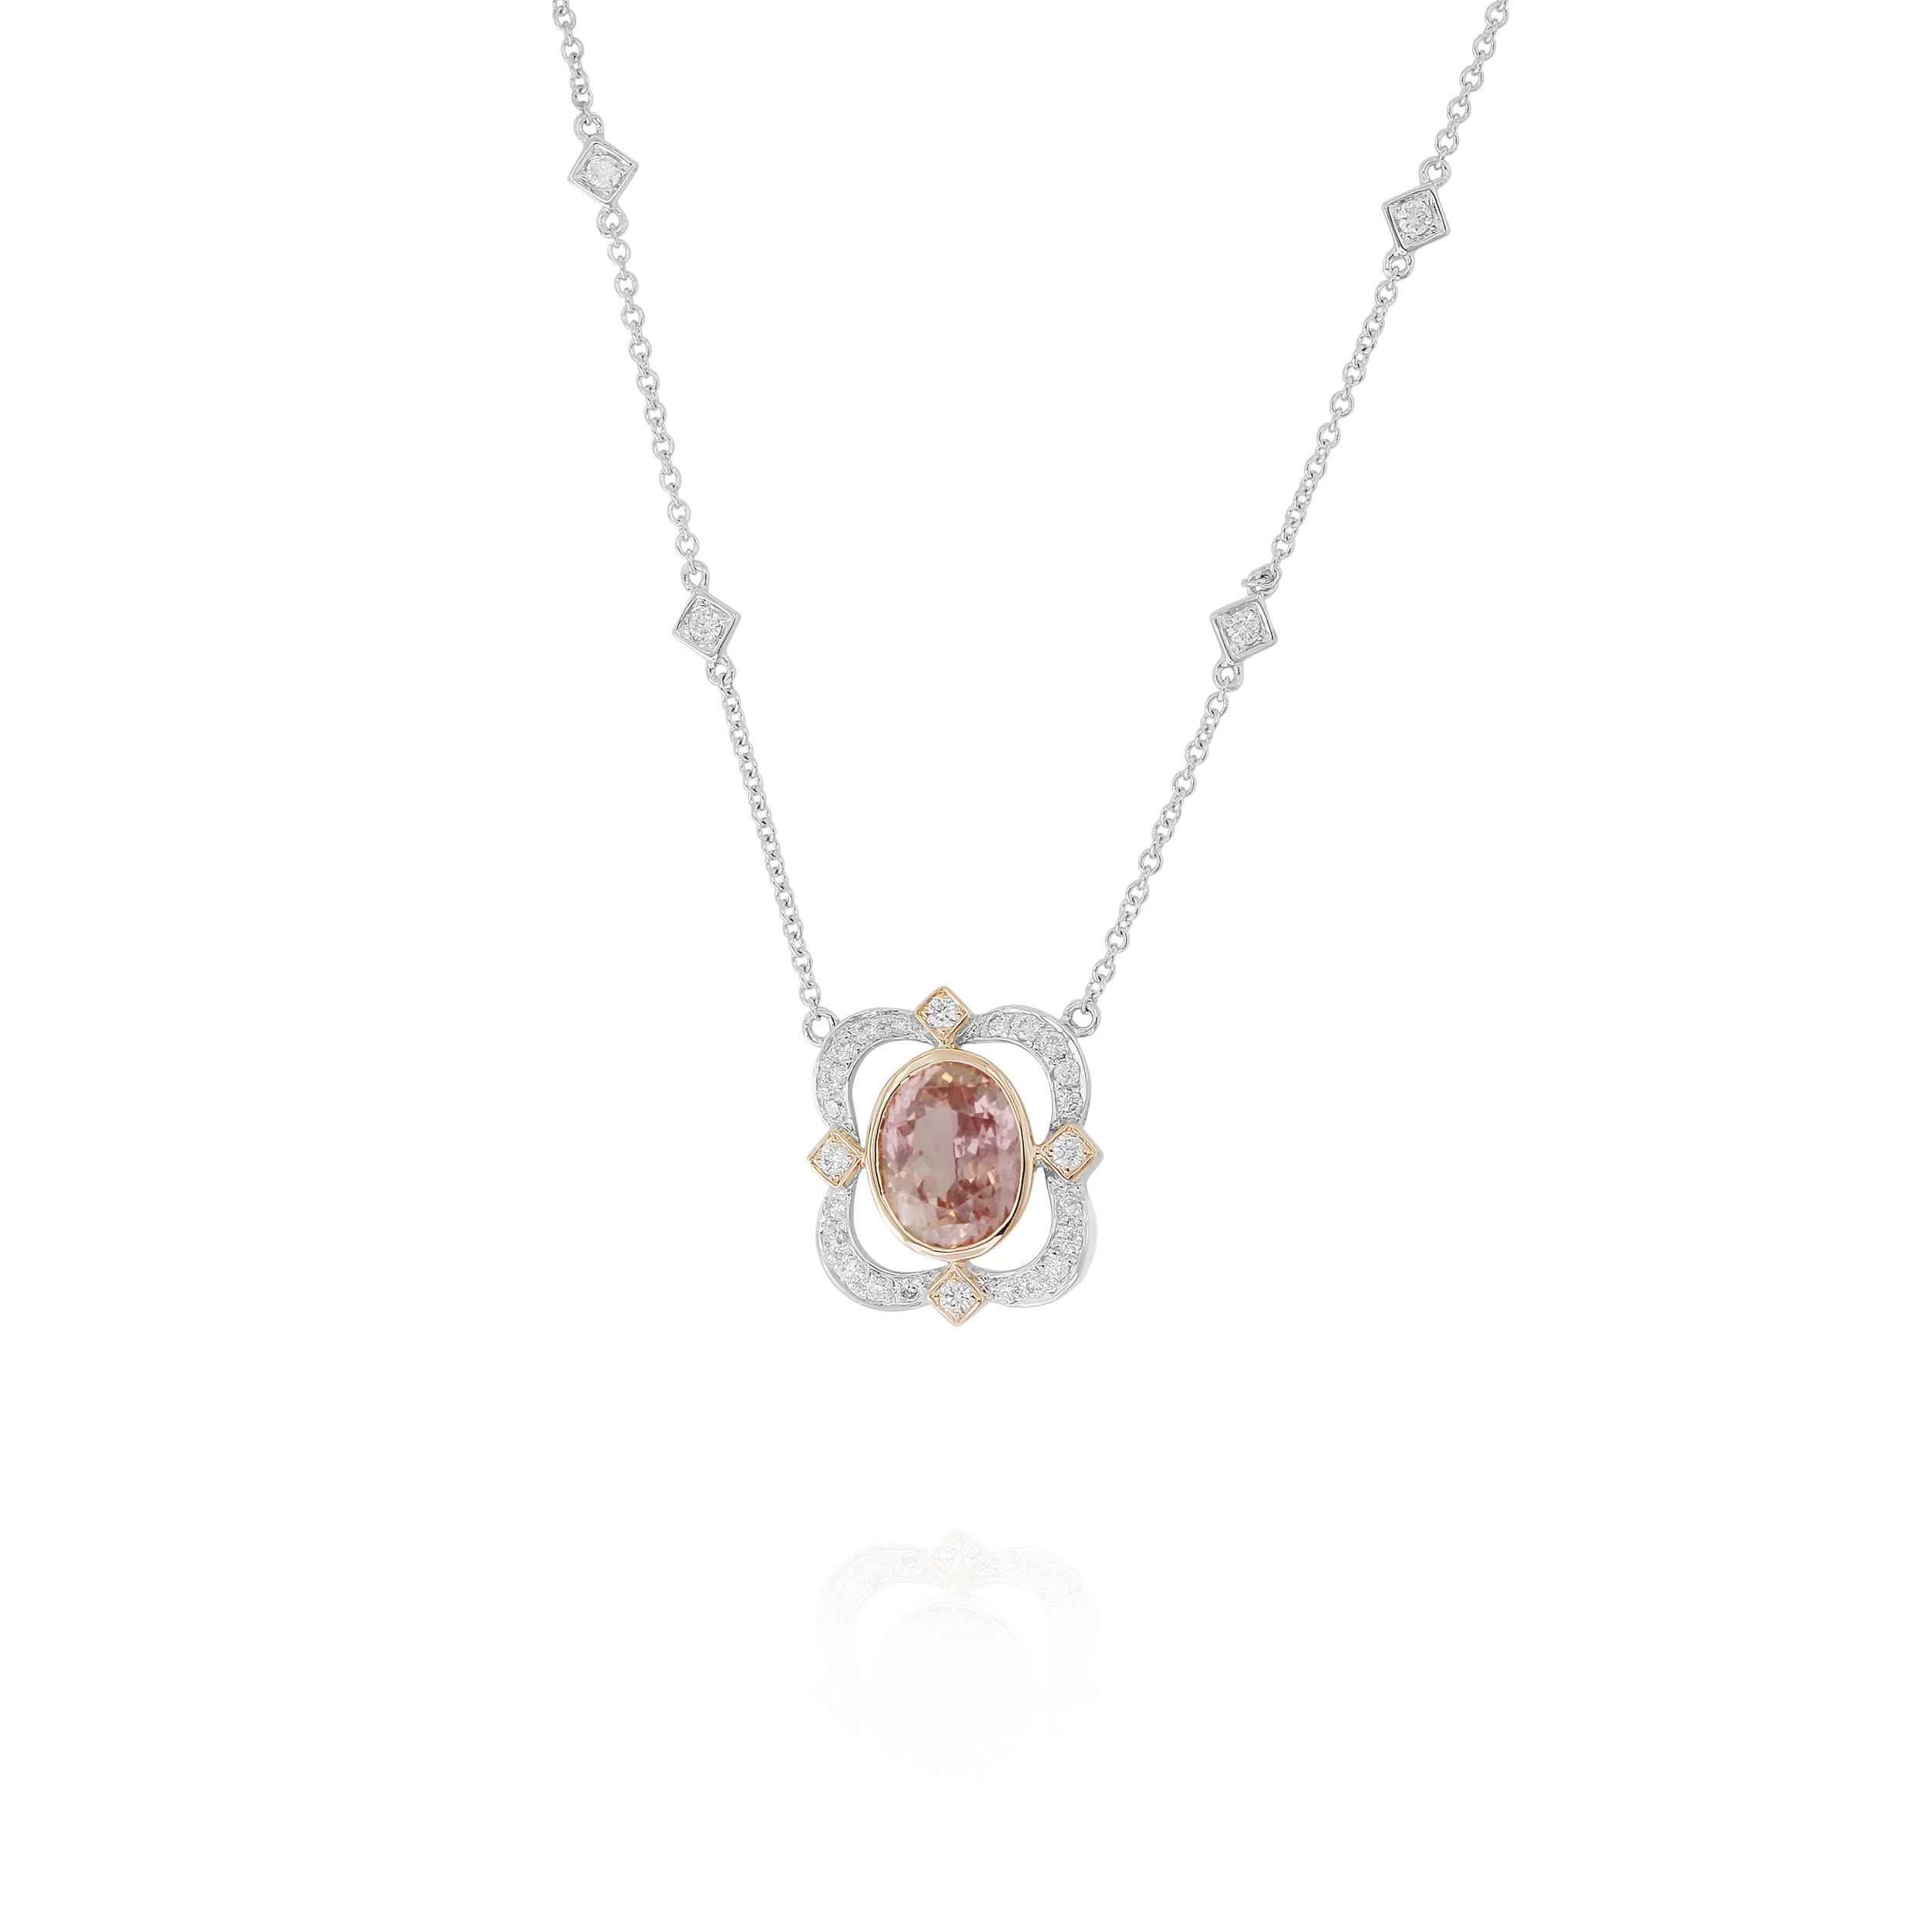 Padparascha Sapphire Pendant.jpg